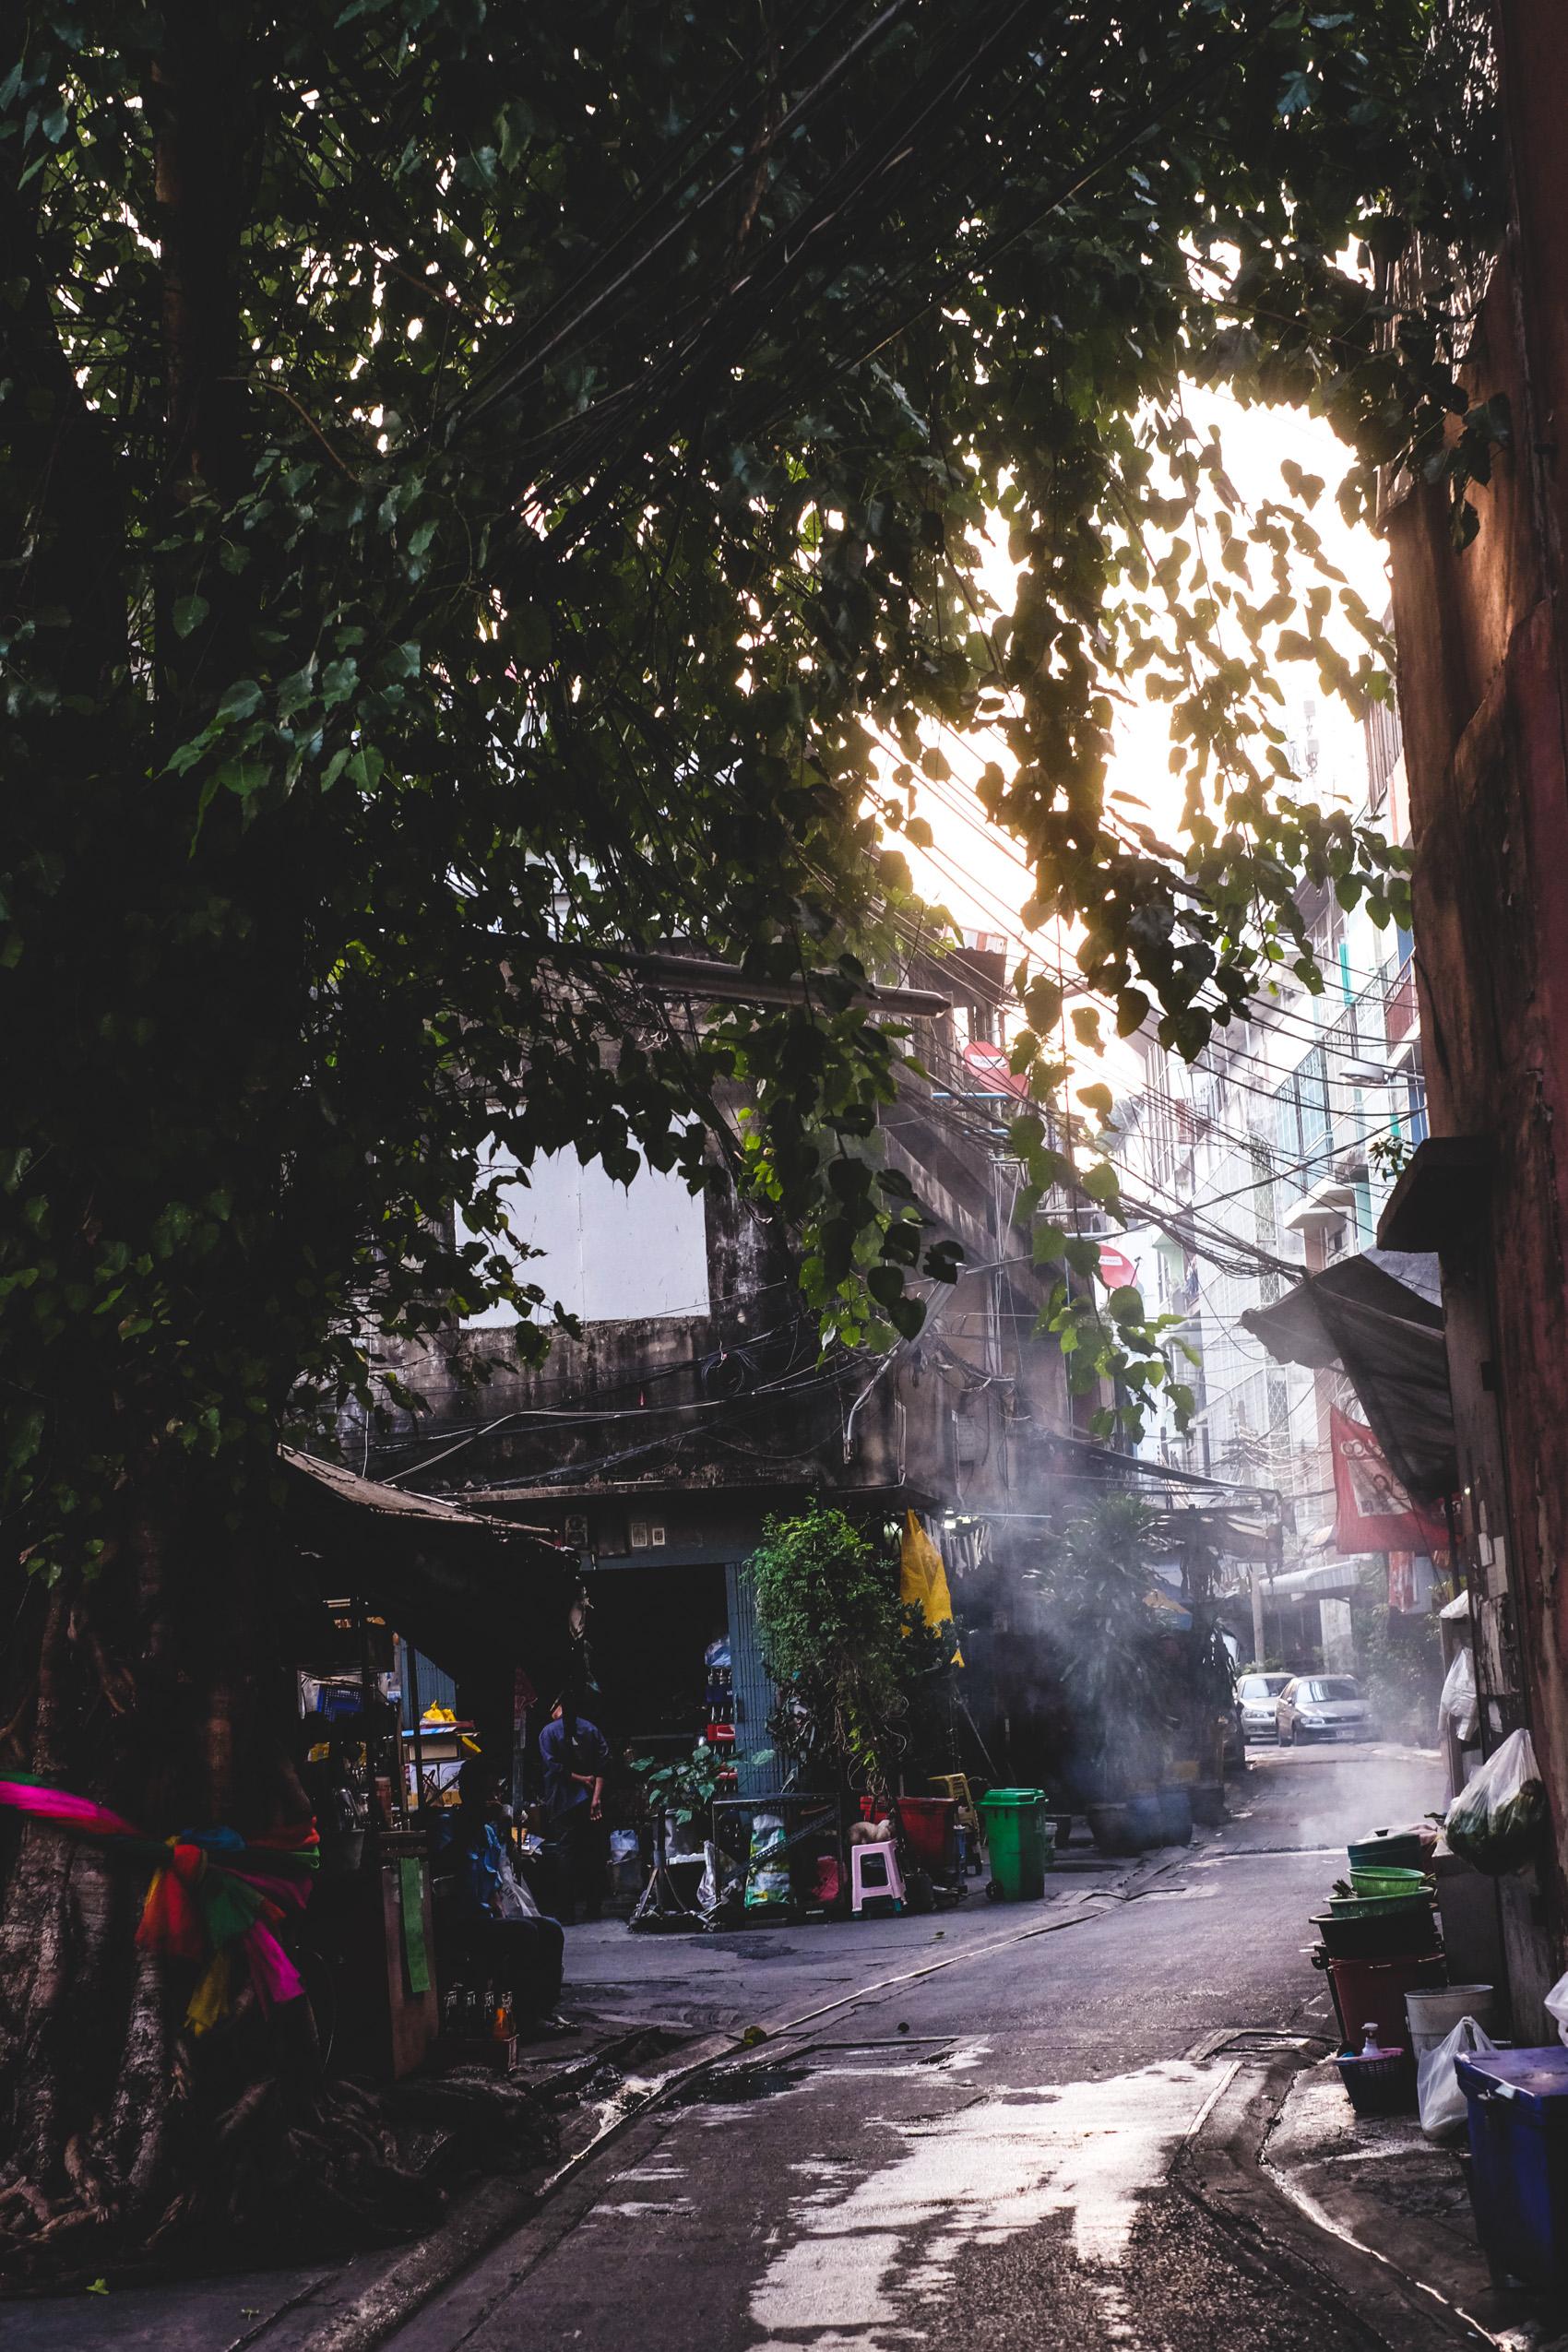 bangkok-29-of-30